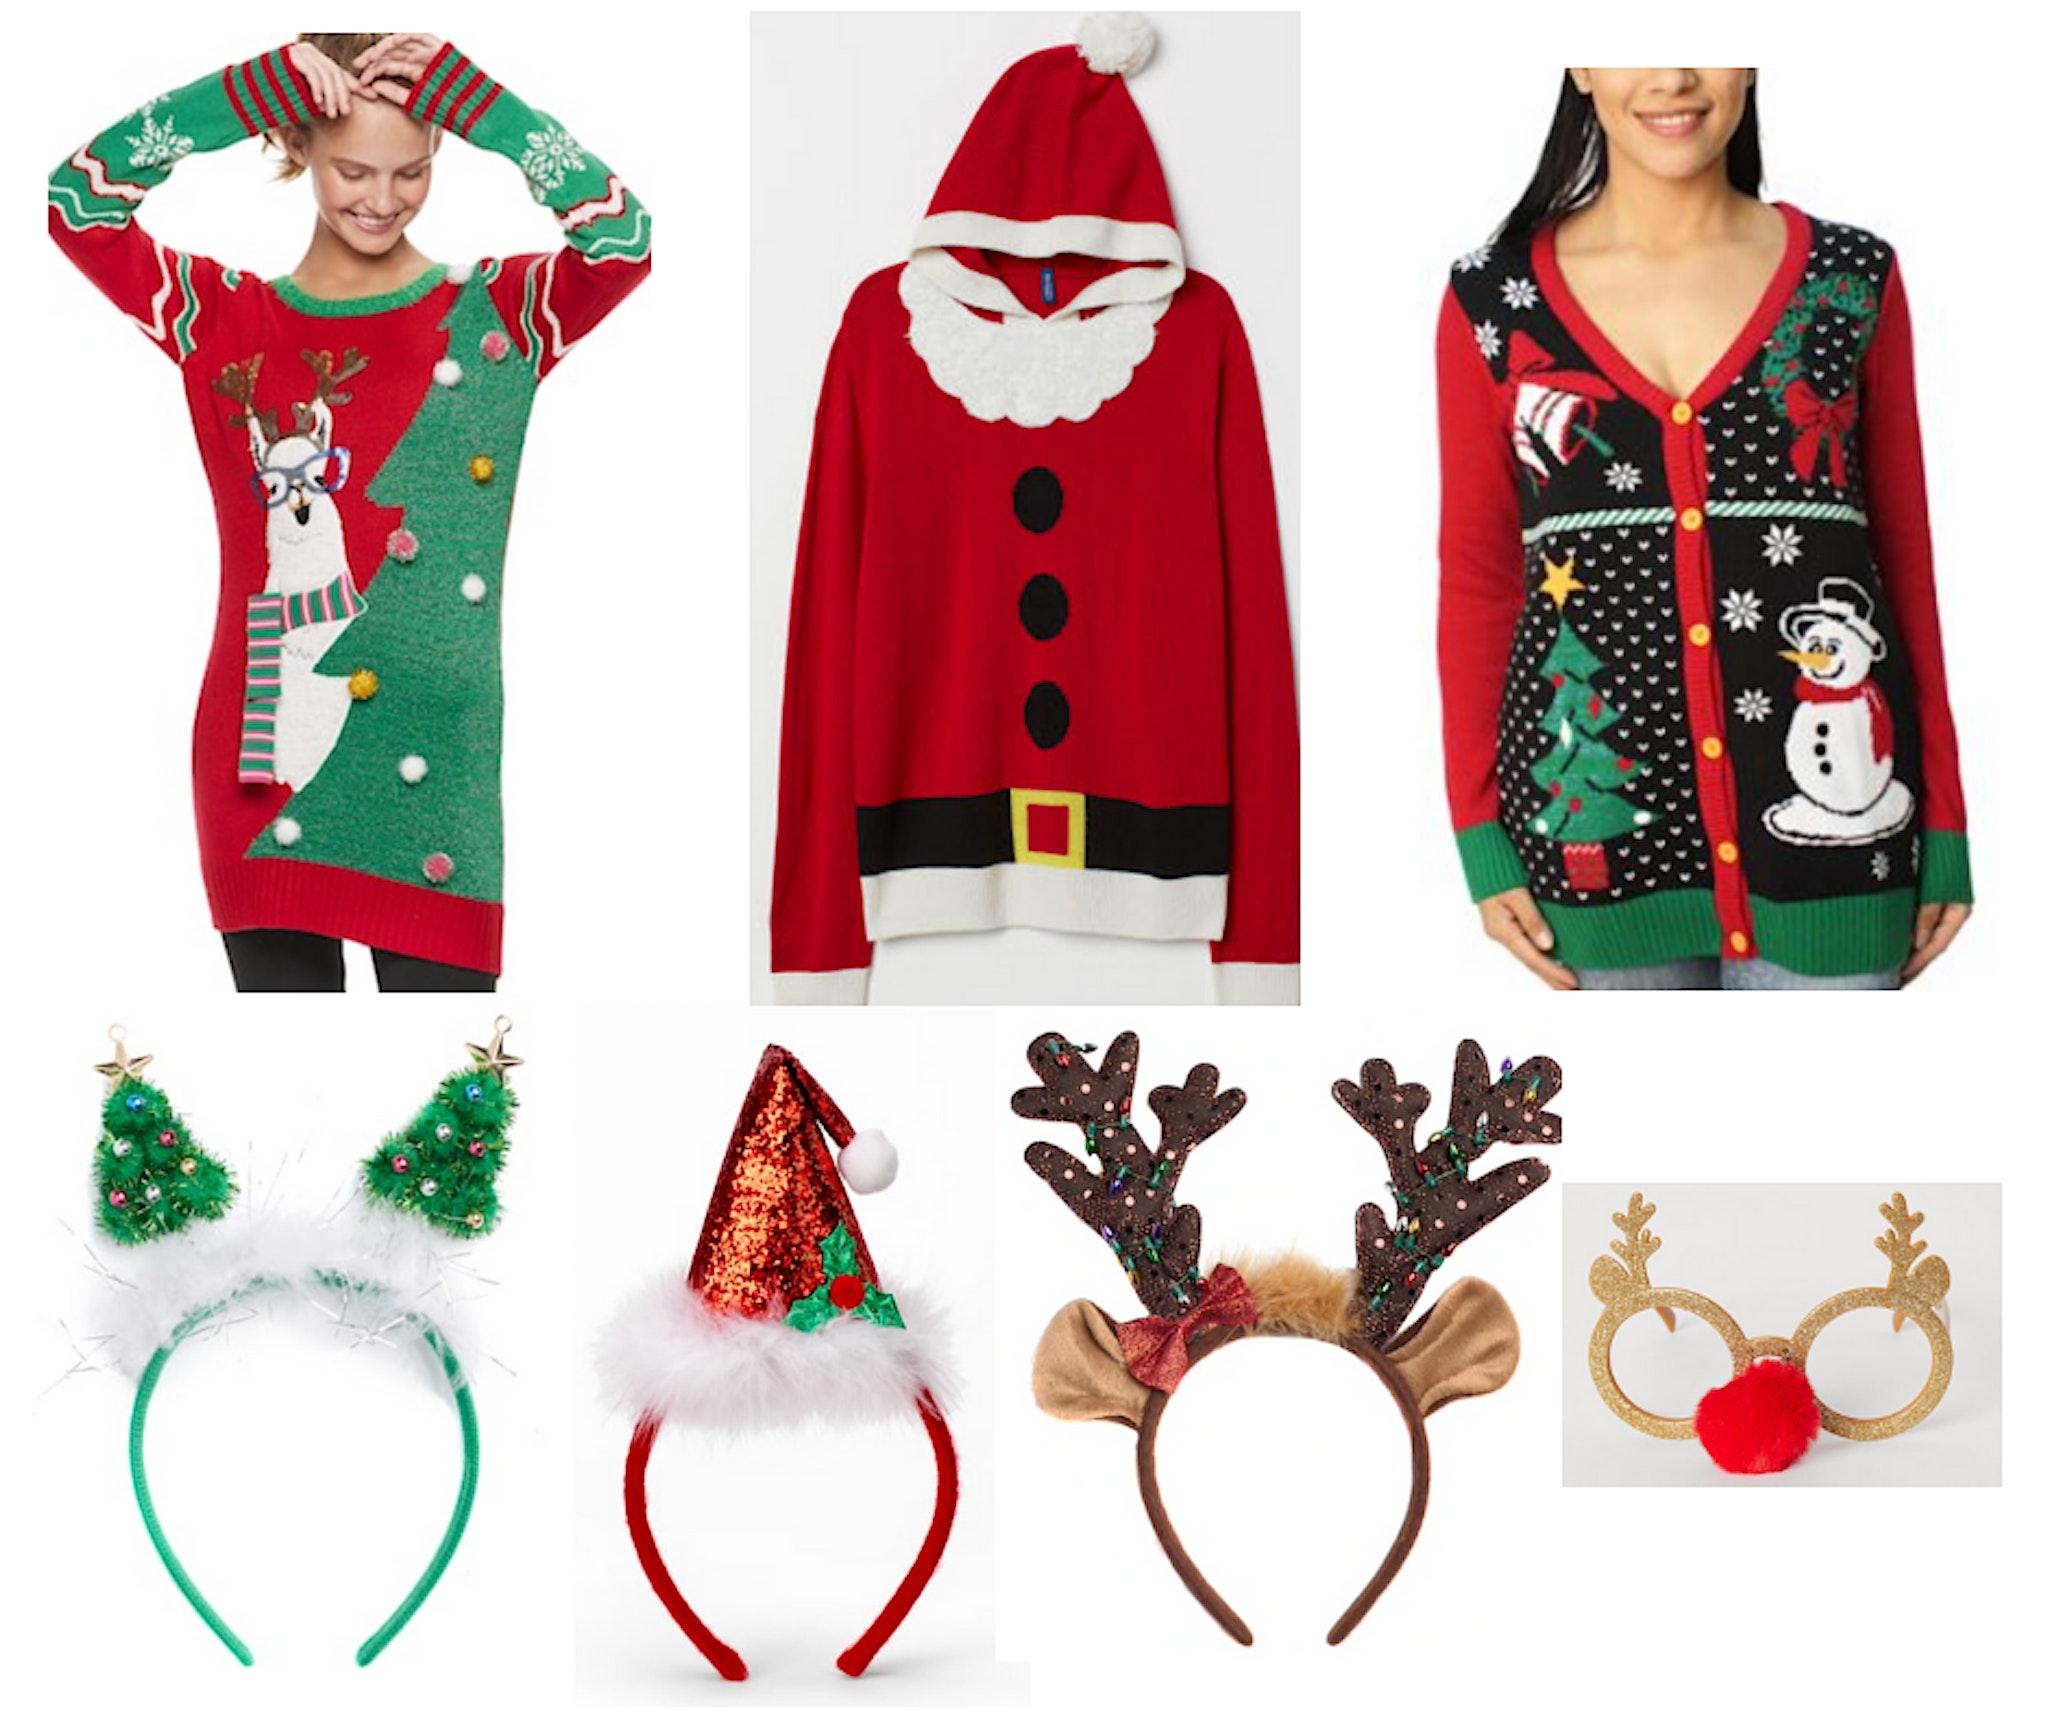 Ugly Christmas Sweaters and Christmas Headbands